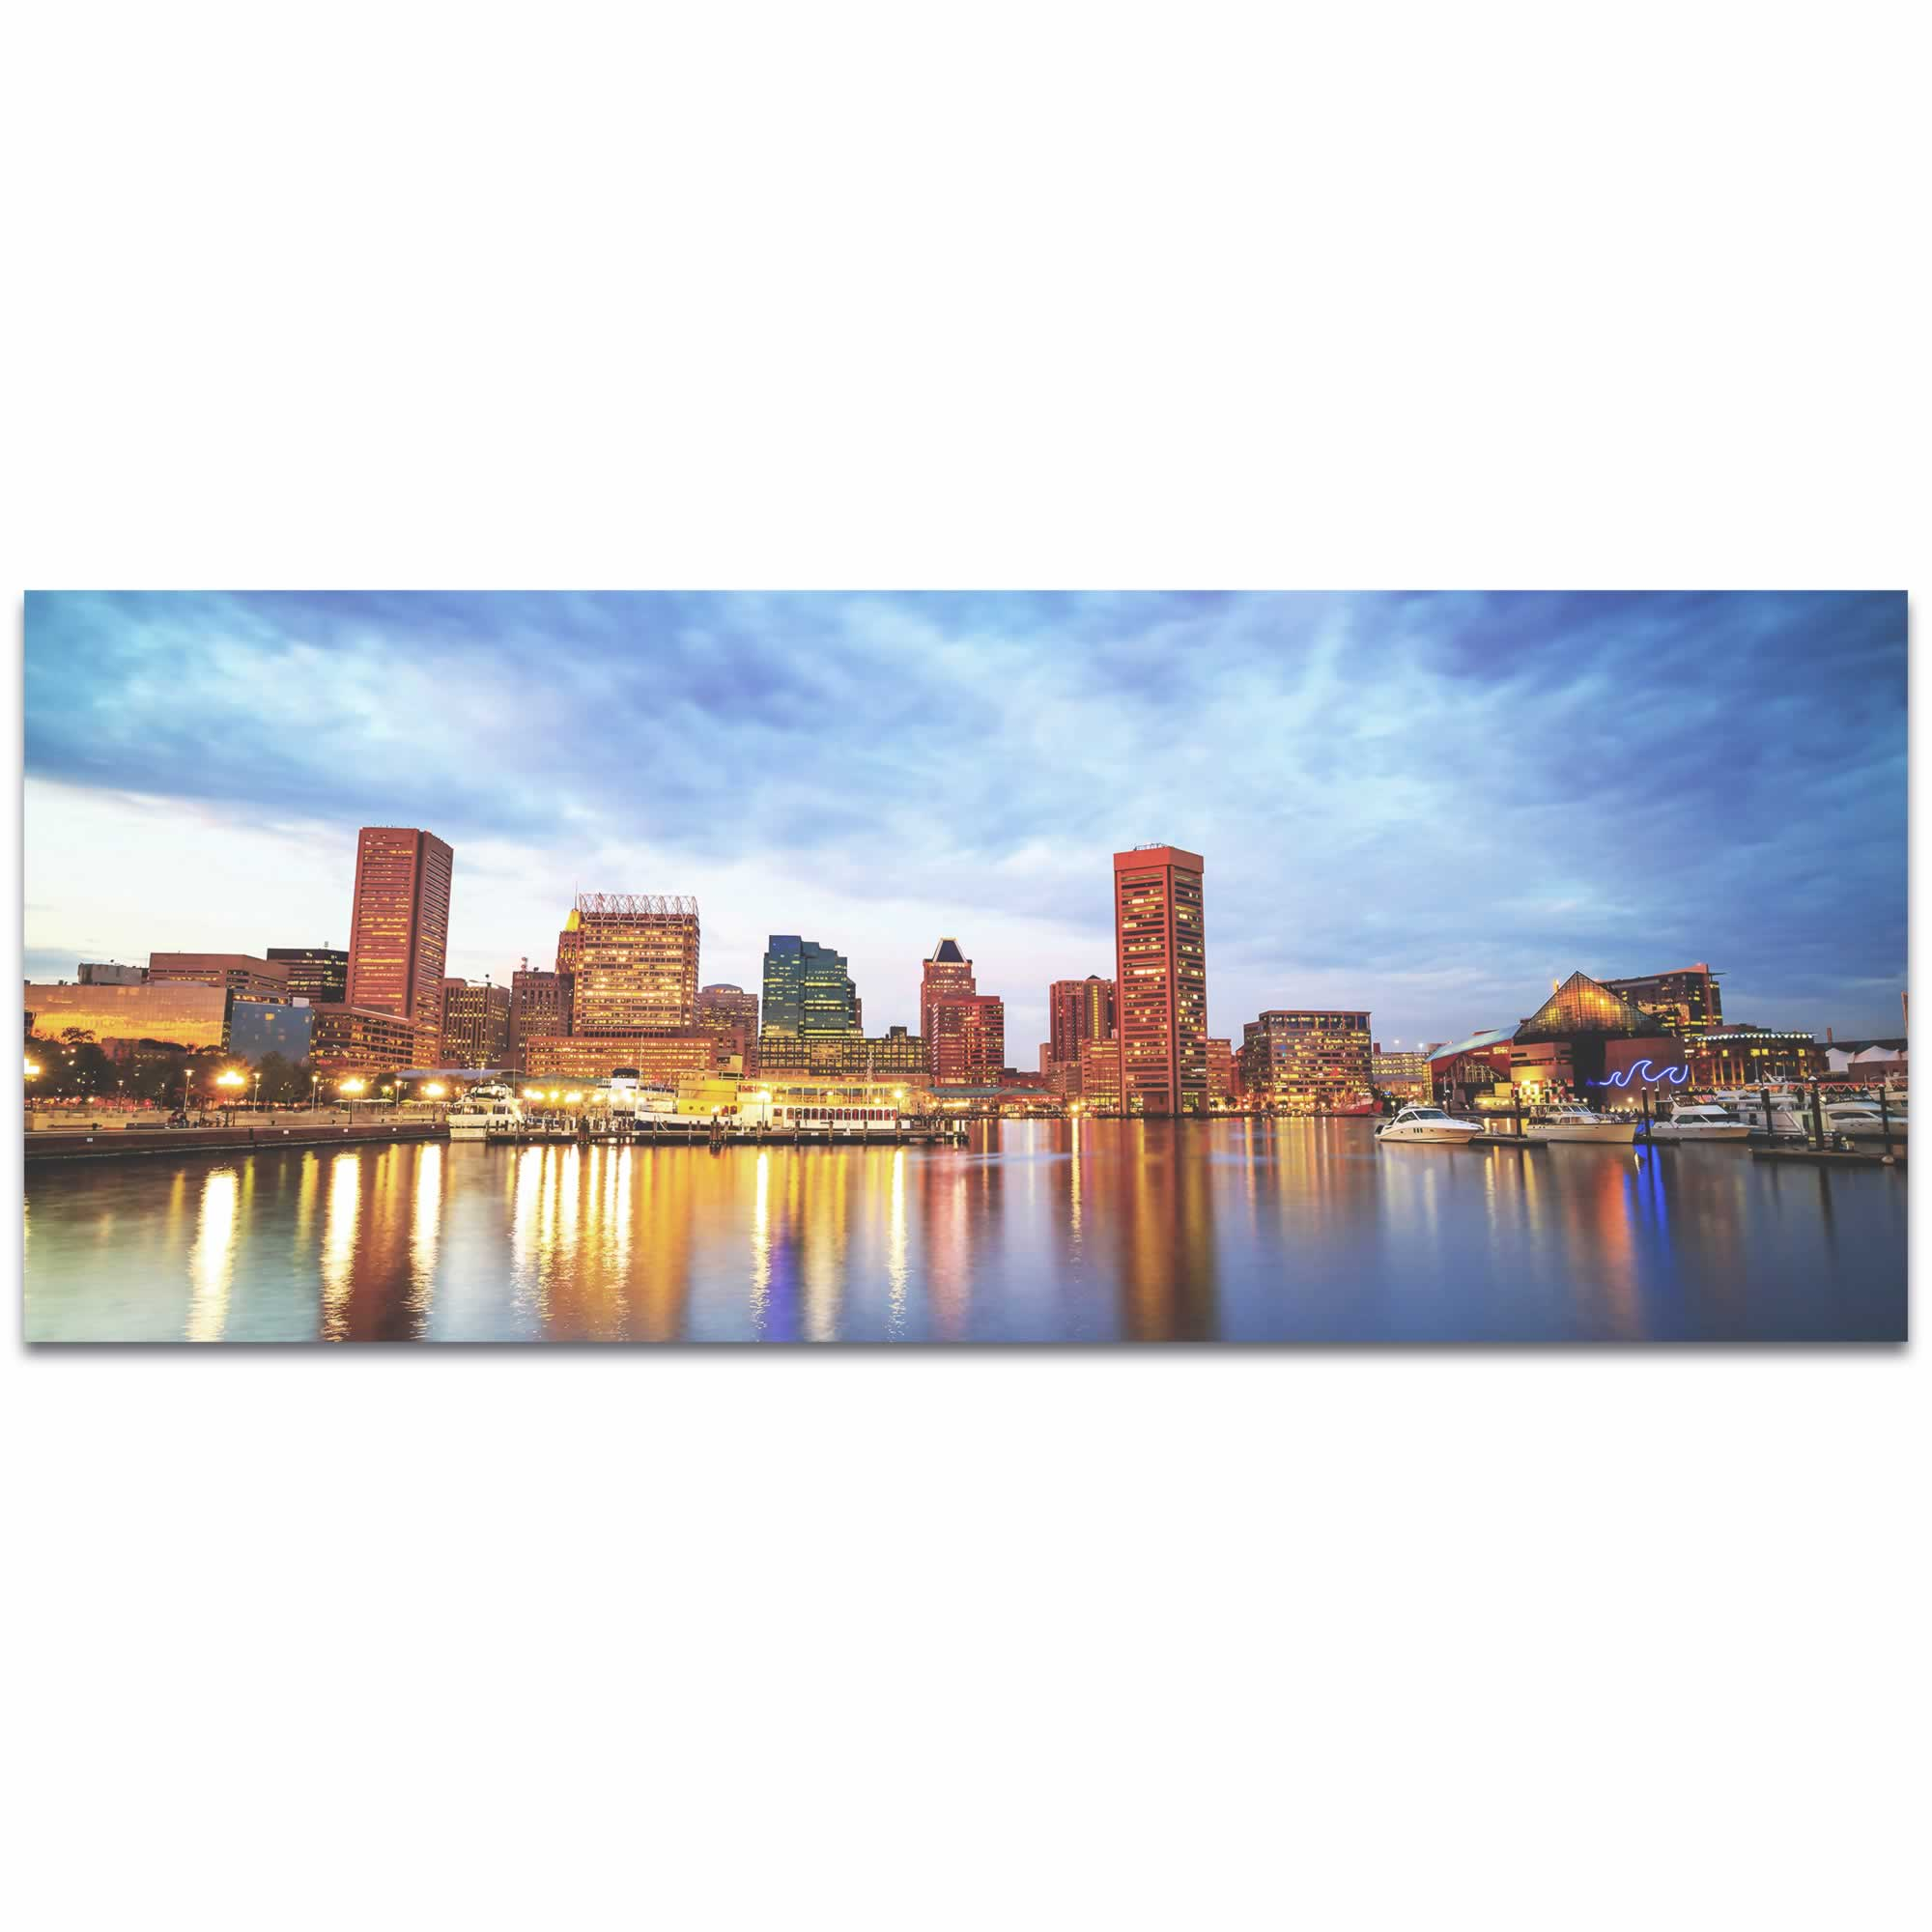 Baltimore City Skyline - Urban Modern Art, Designer Home Decor, Cityscape Wall Artwork, Trendy Contemporary Art - Alternate View 2